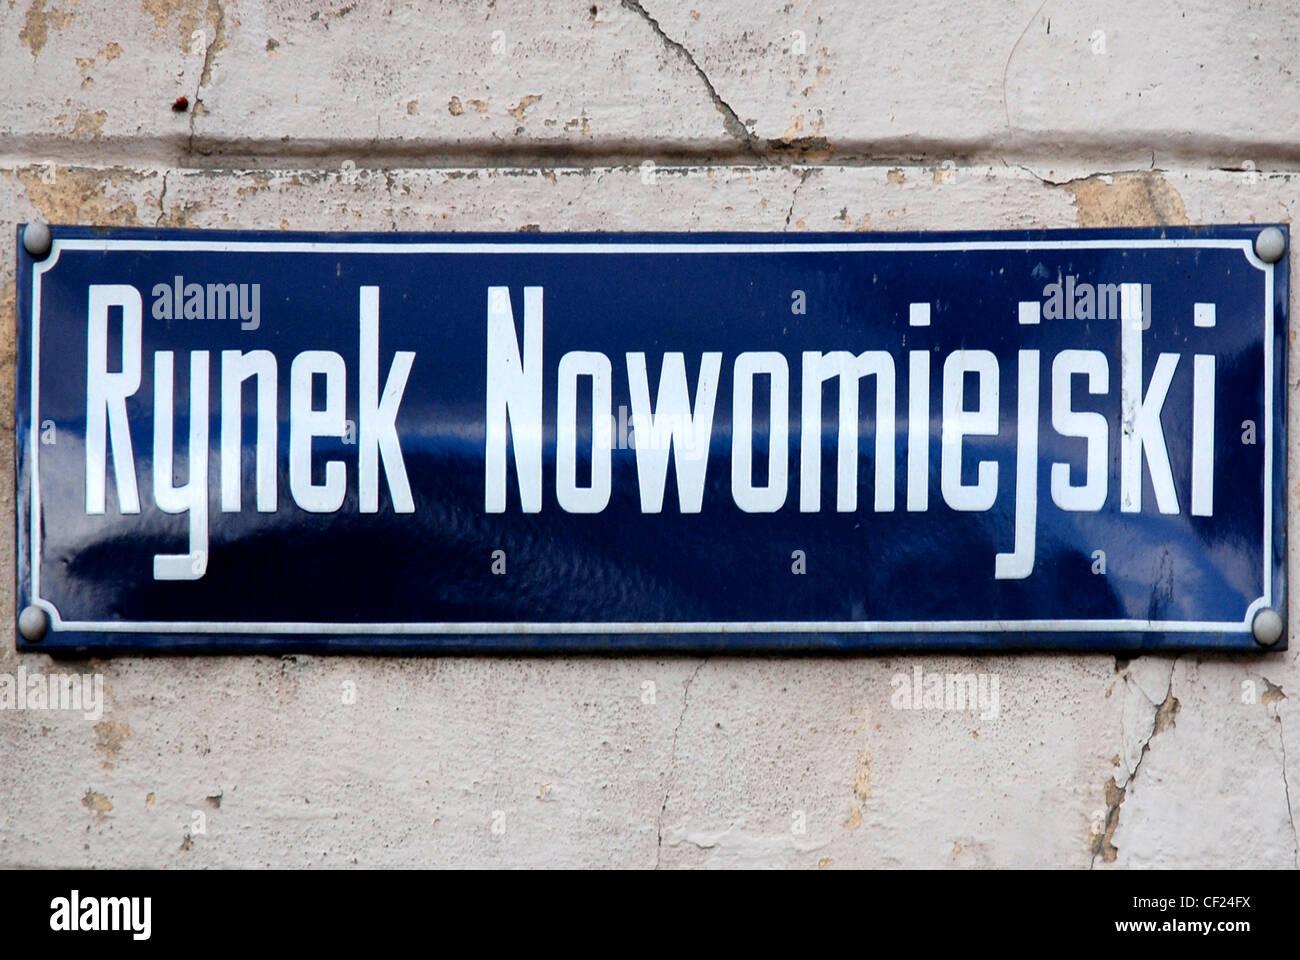 Road sign Rynek Nowomiejski in Torun. - Stock Image